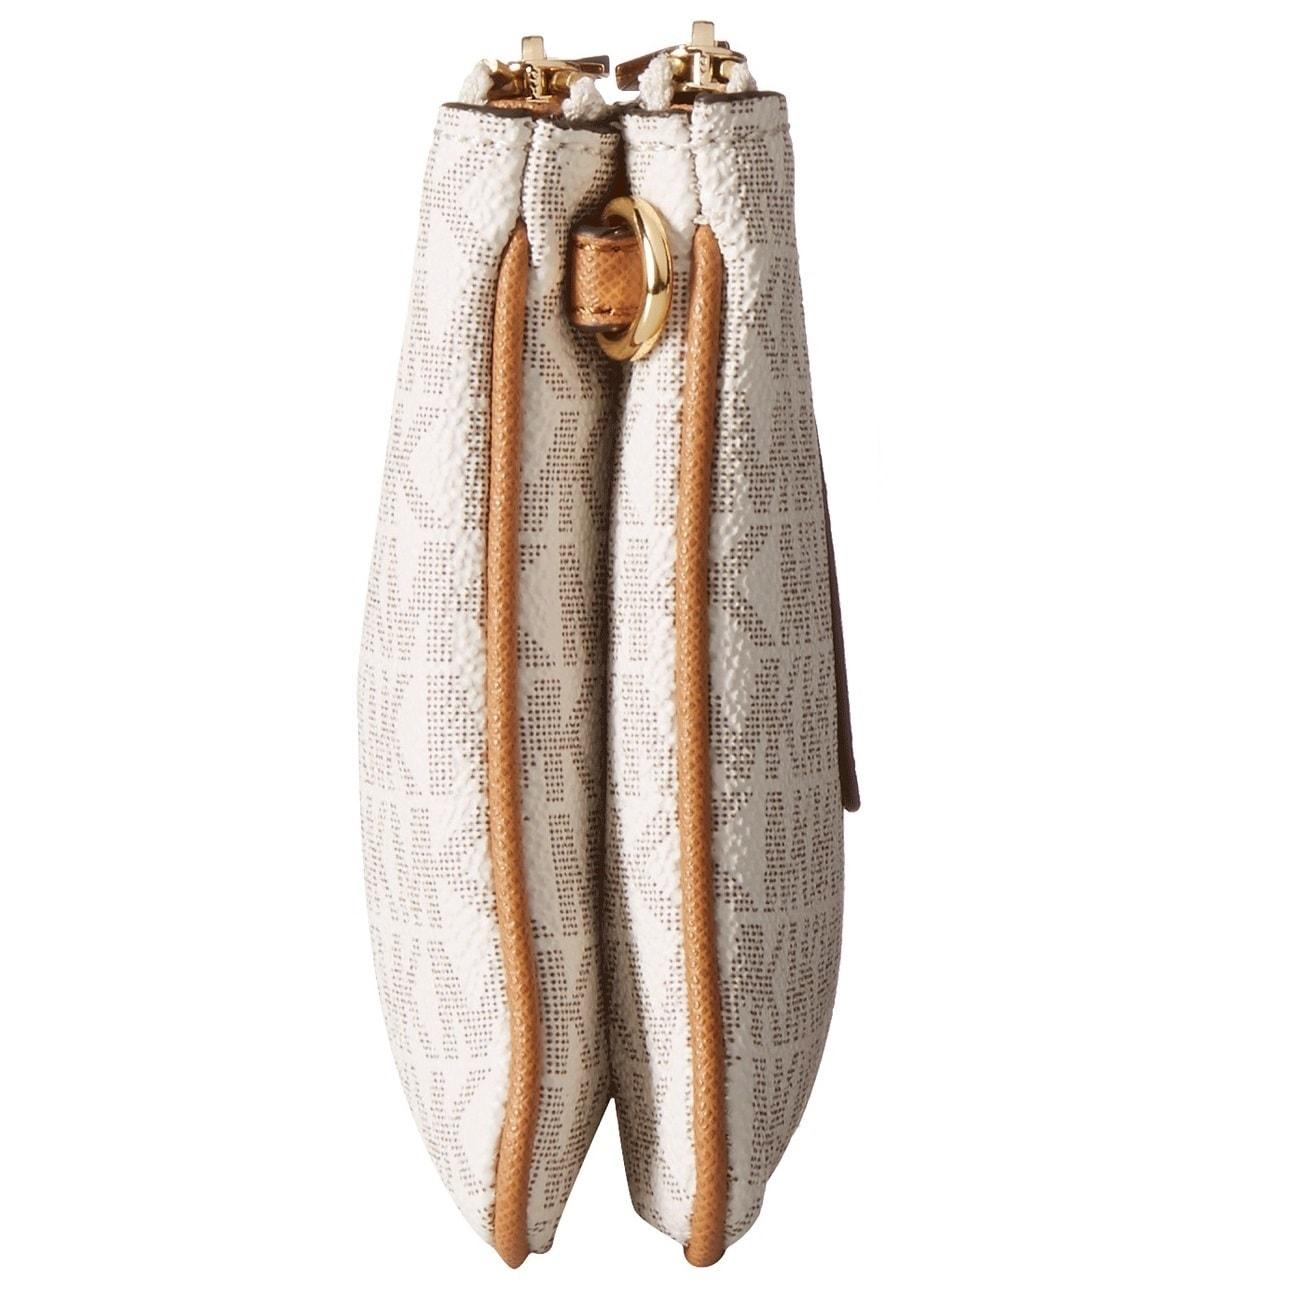 81e502fe583e Shop Michael Kors Large Double Zip Vanilla Acorn Wristlet with Pocket -  Free Shipping Today - Overstock - 13748849